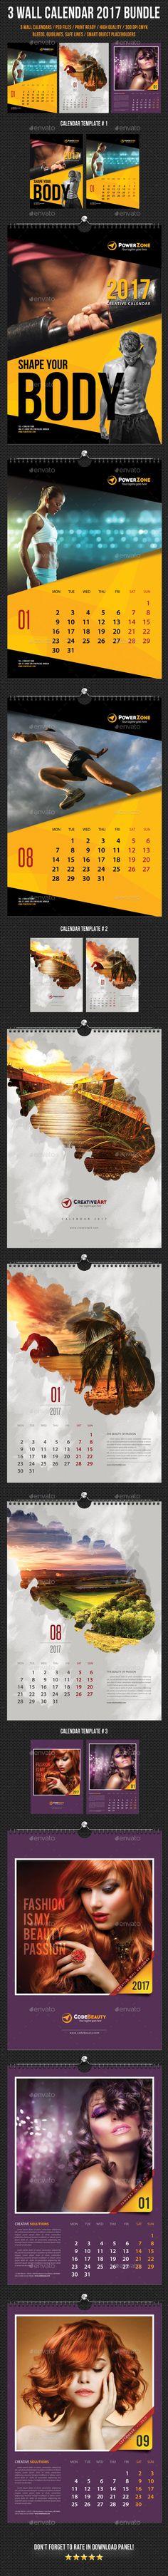 3 Creative Wall Calendar 2017 Templates PSD